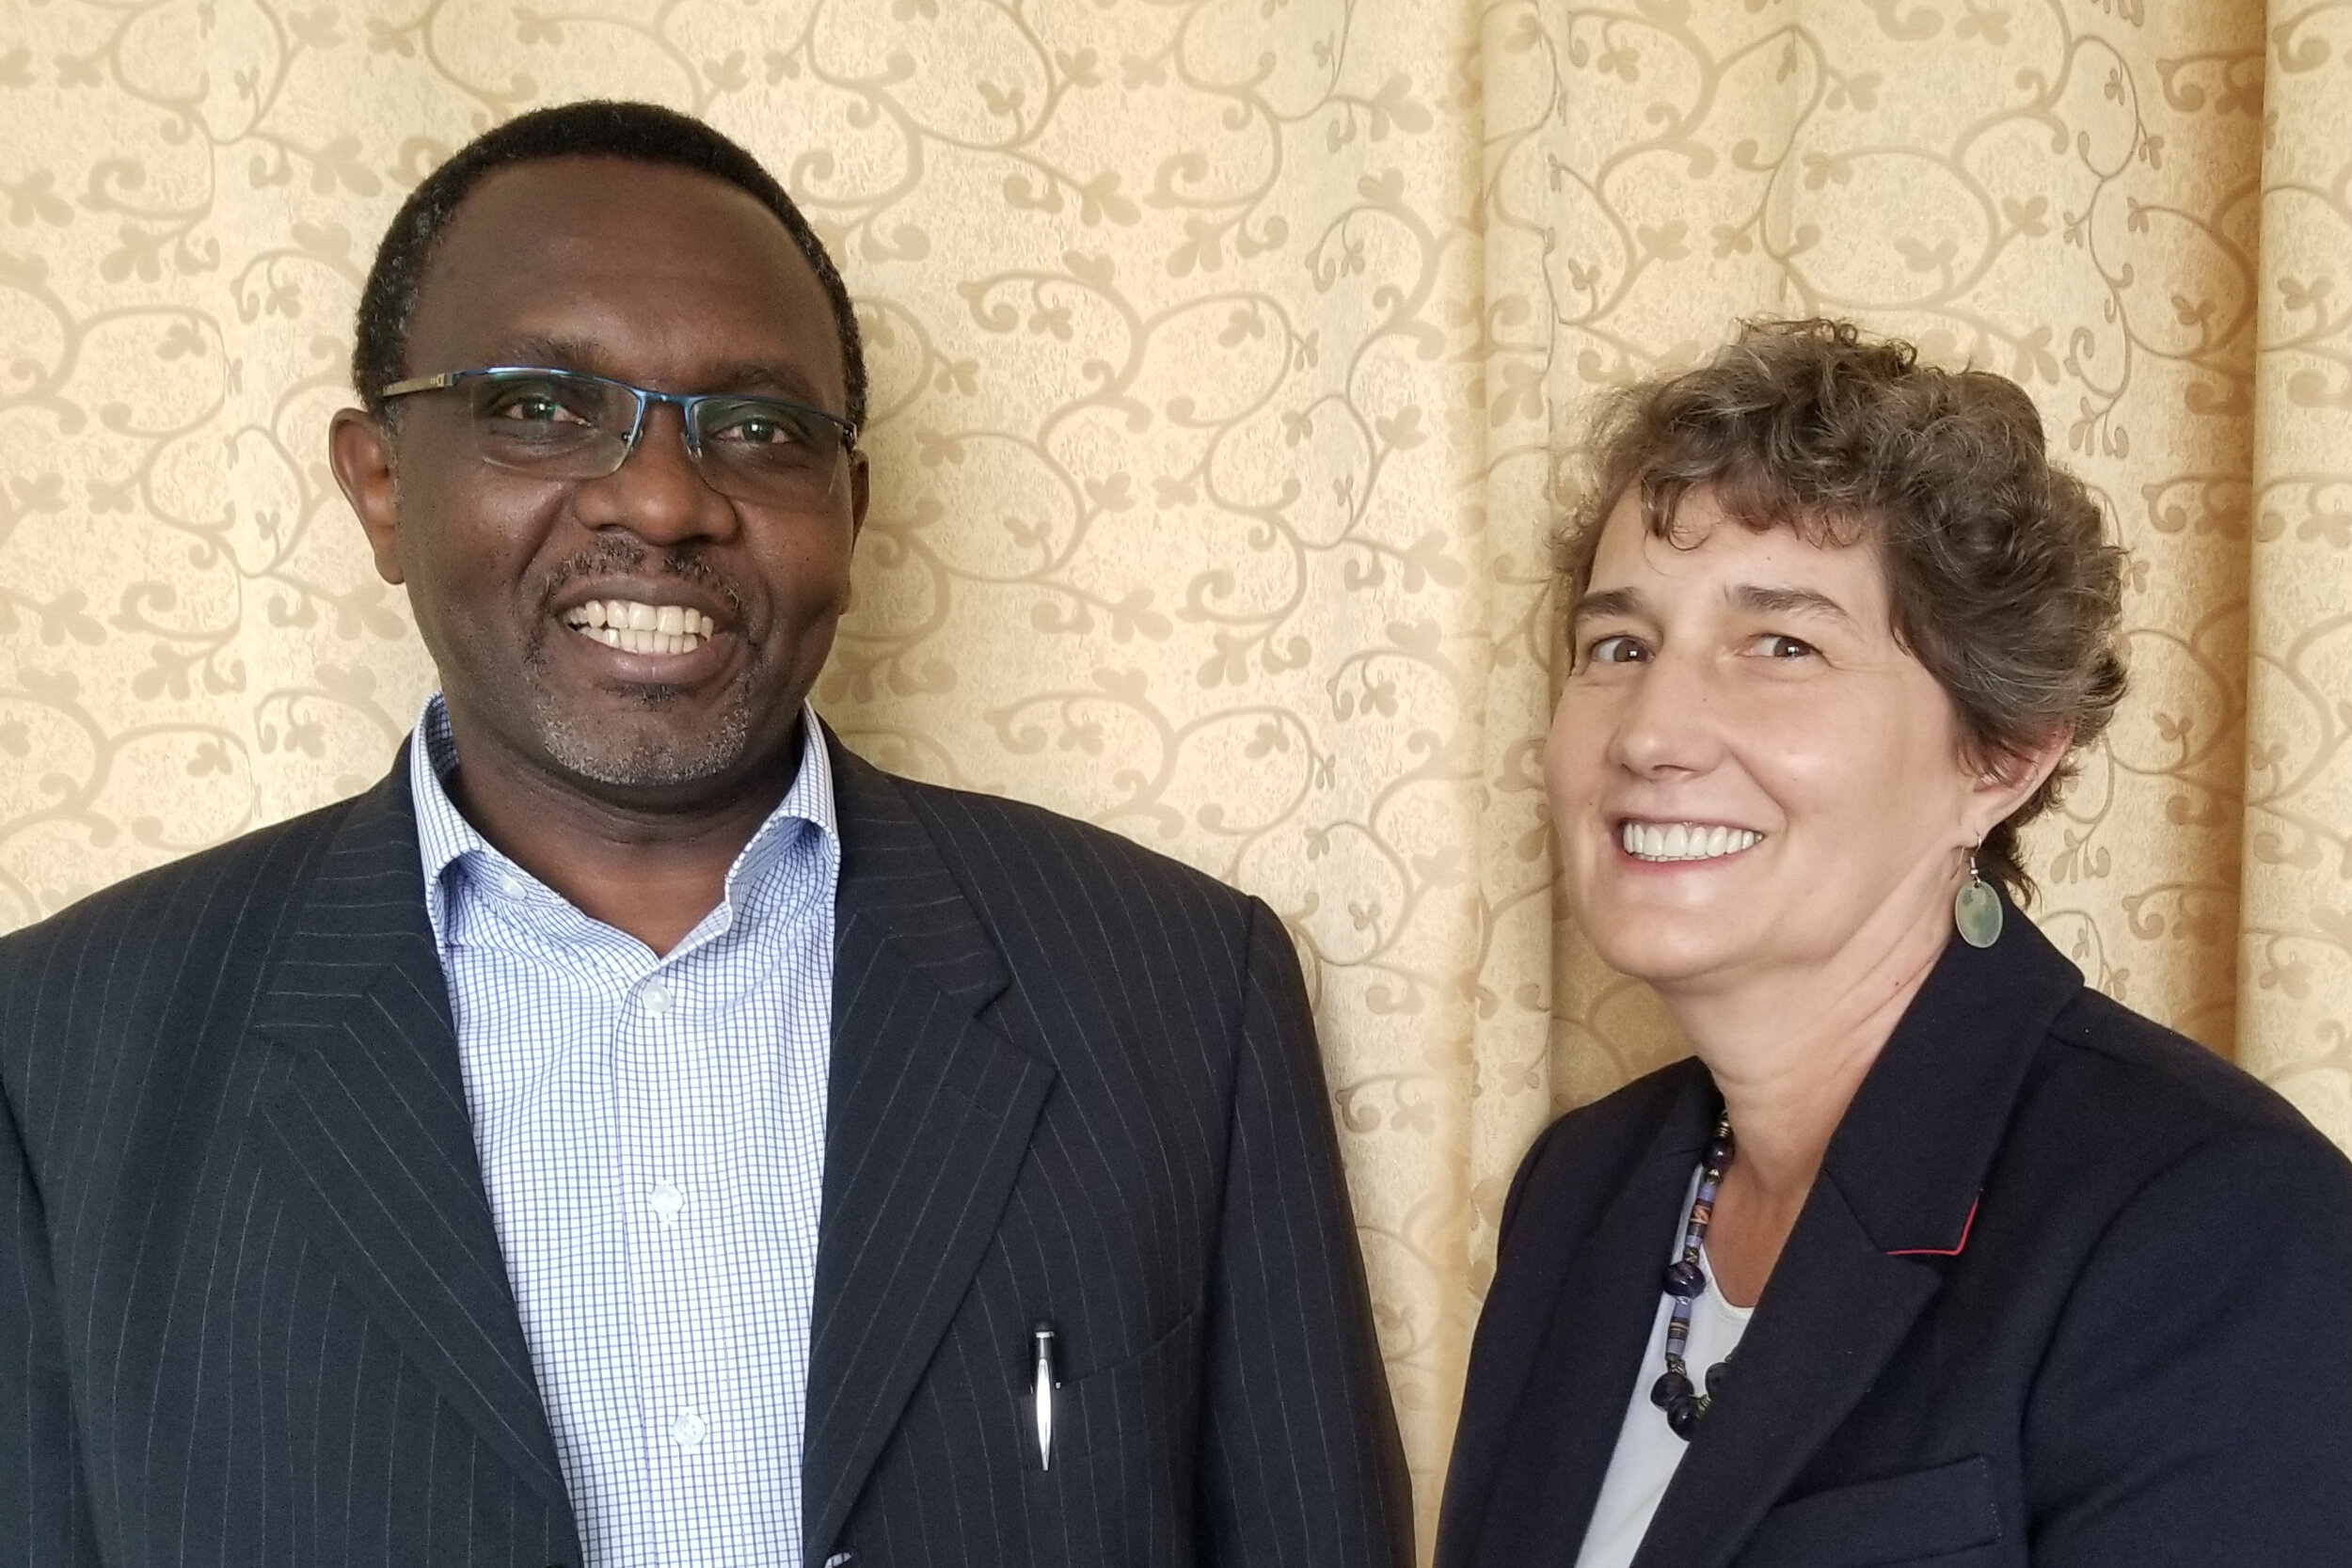 Professor Winstone Nyandiko and Dr. Kara Wools-Kaloustian are AMPATH's directors or research.